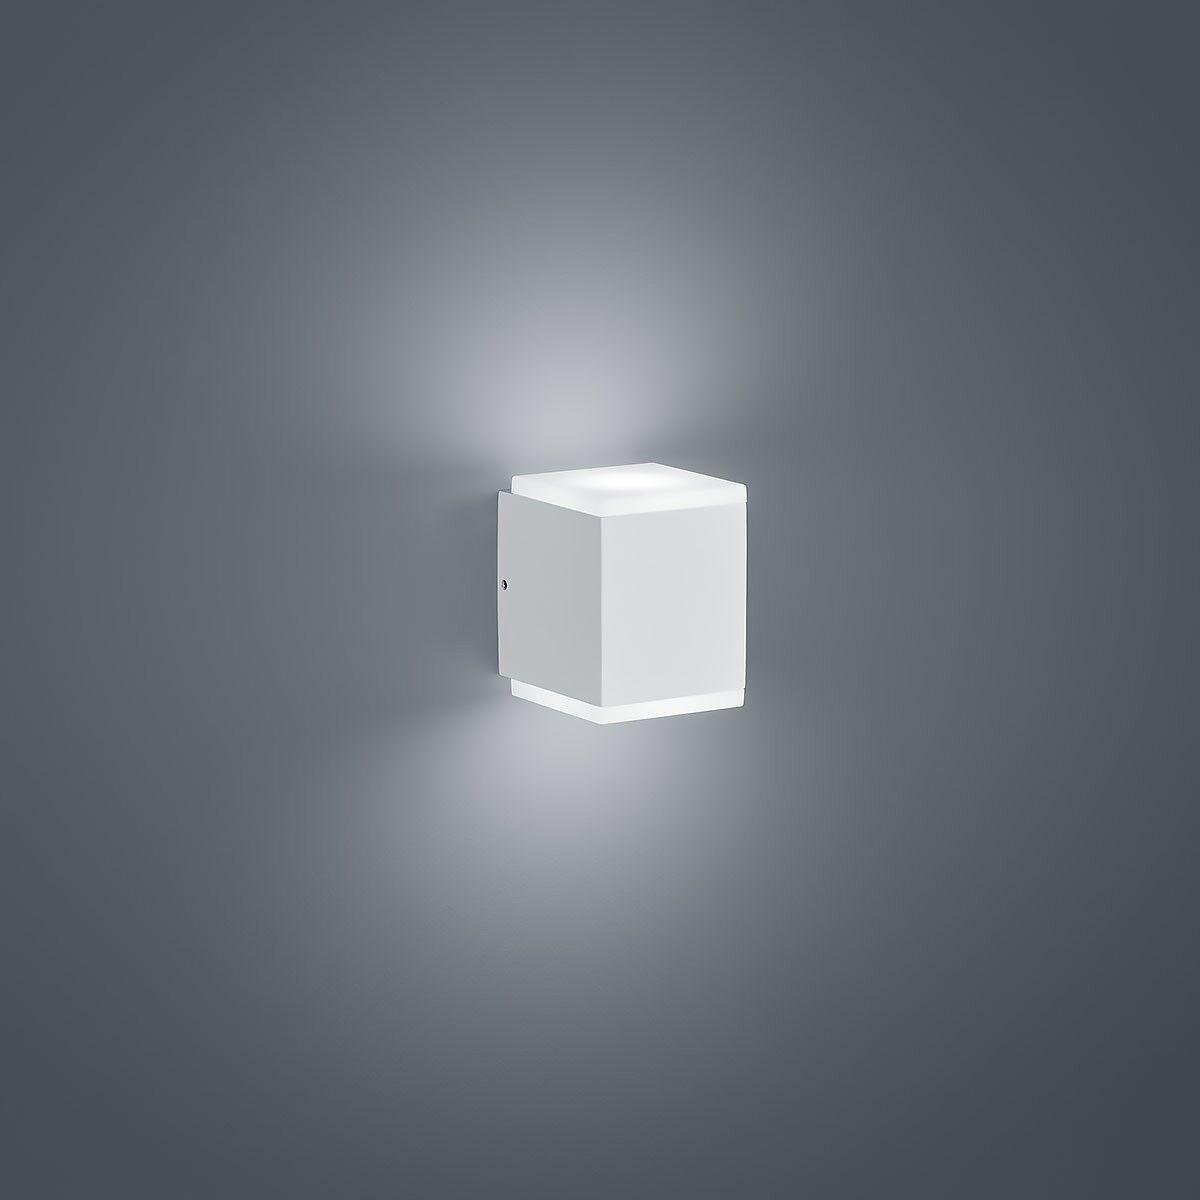 Helestra Kibo LED Exterior-Luz blancoo Mate A28612.07